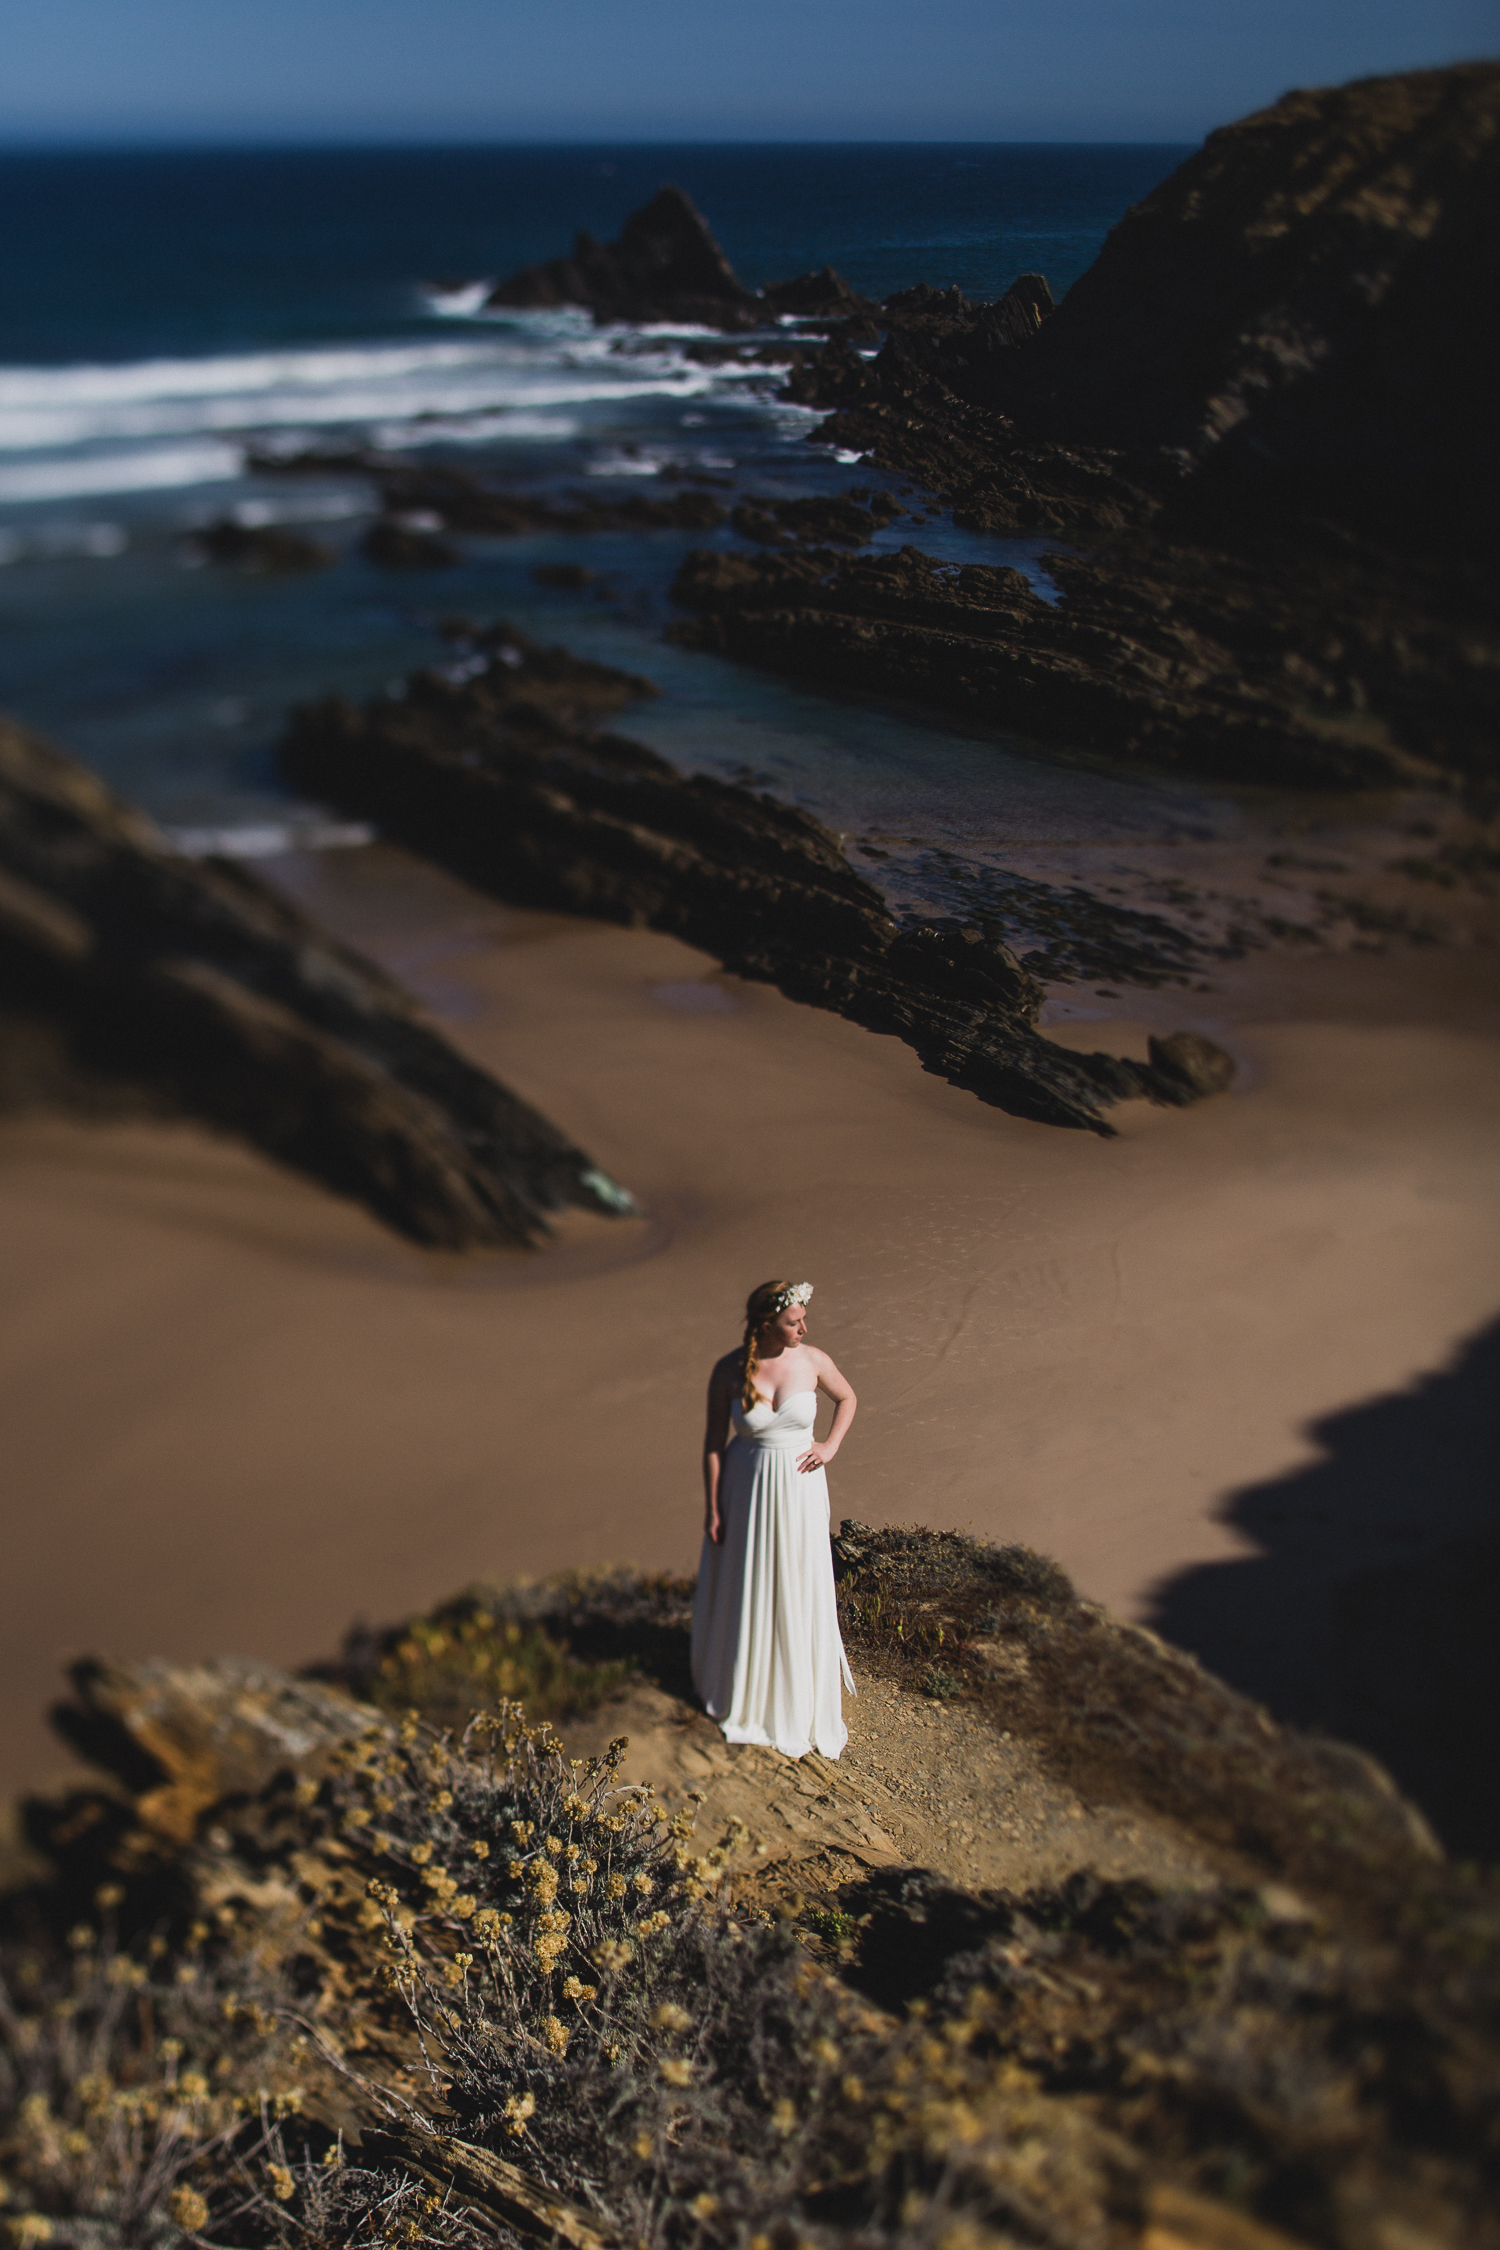 Epic portugal location for bridal portraits